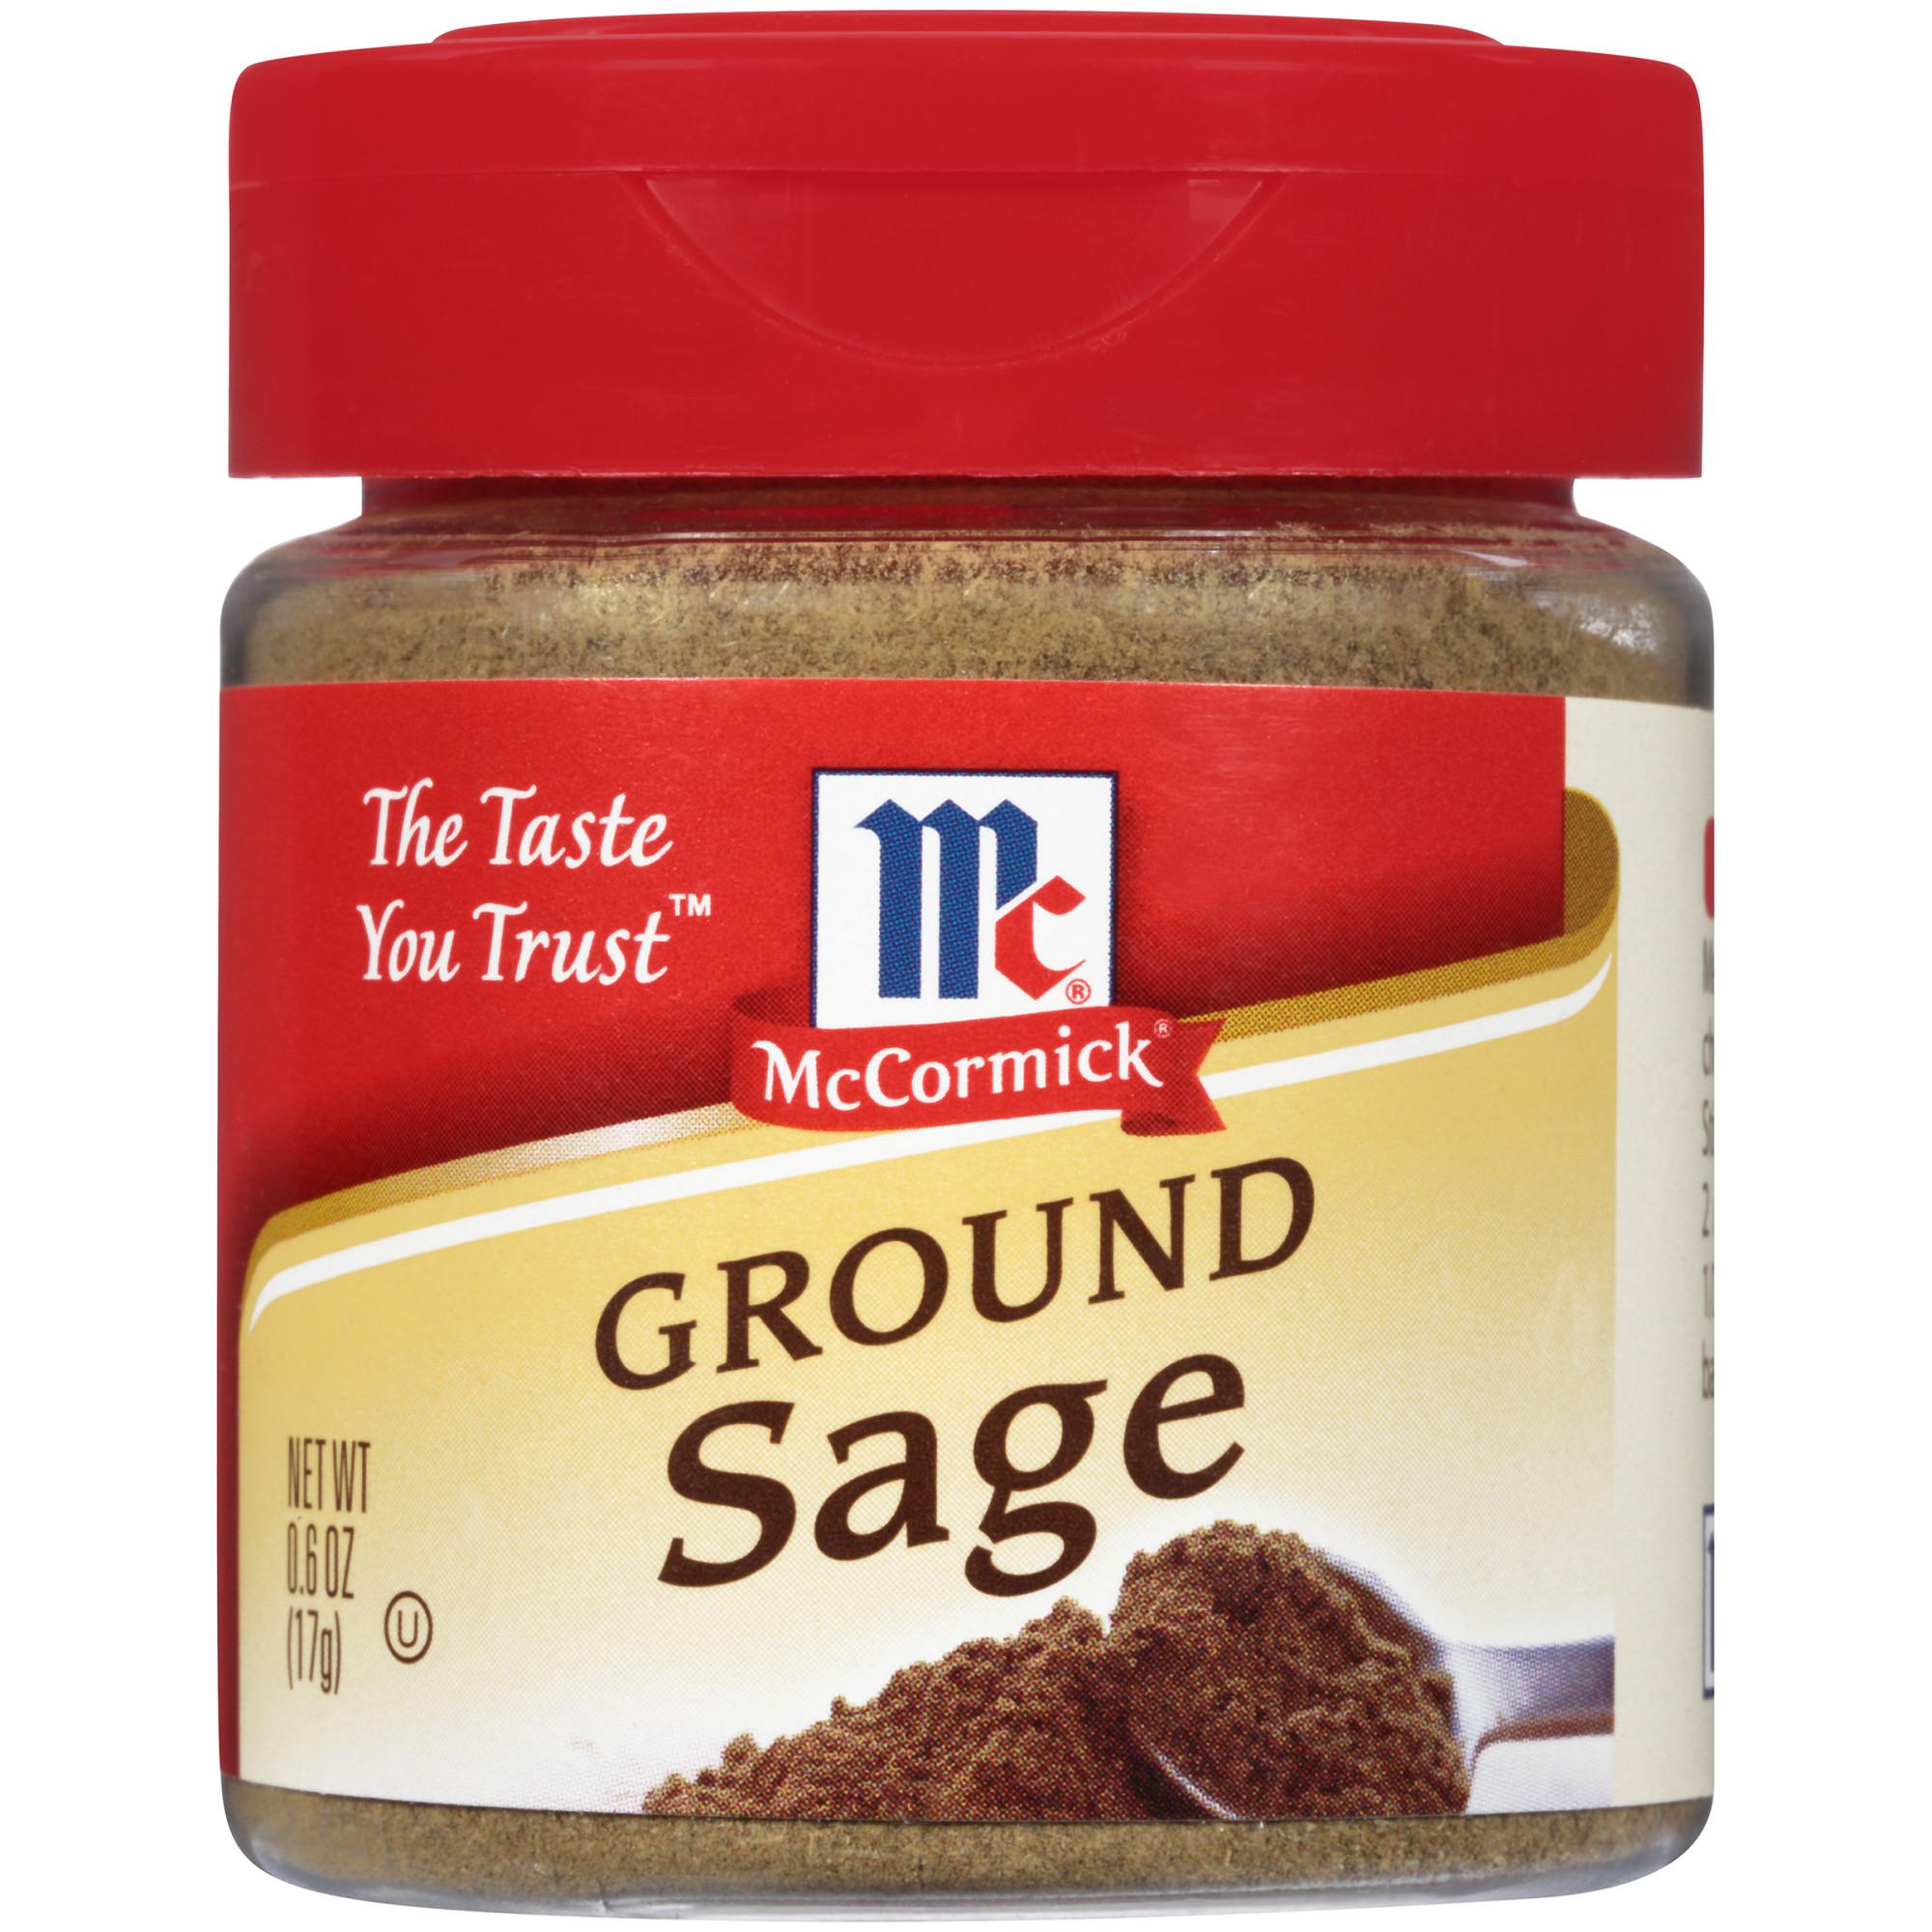 (2 Pack) McCormick Ground Sage, 0.6 oz